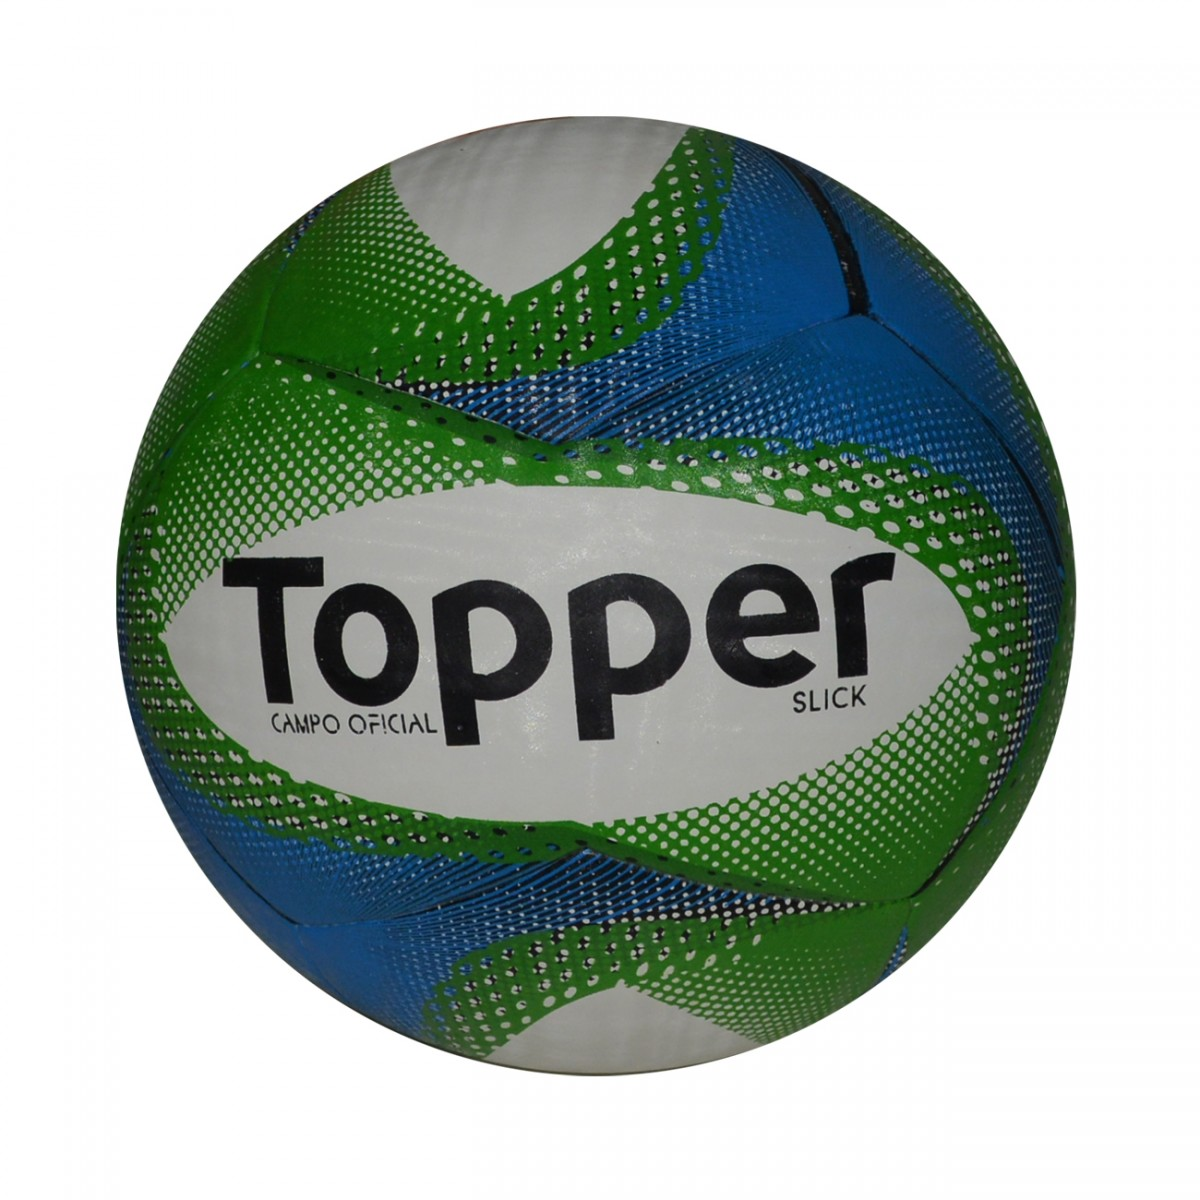 Bola Topper Slick Futsal 9025 - Branco Azul Verde - Chuteira Nike ... c9f4d87cf3a9a